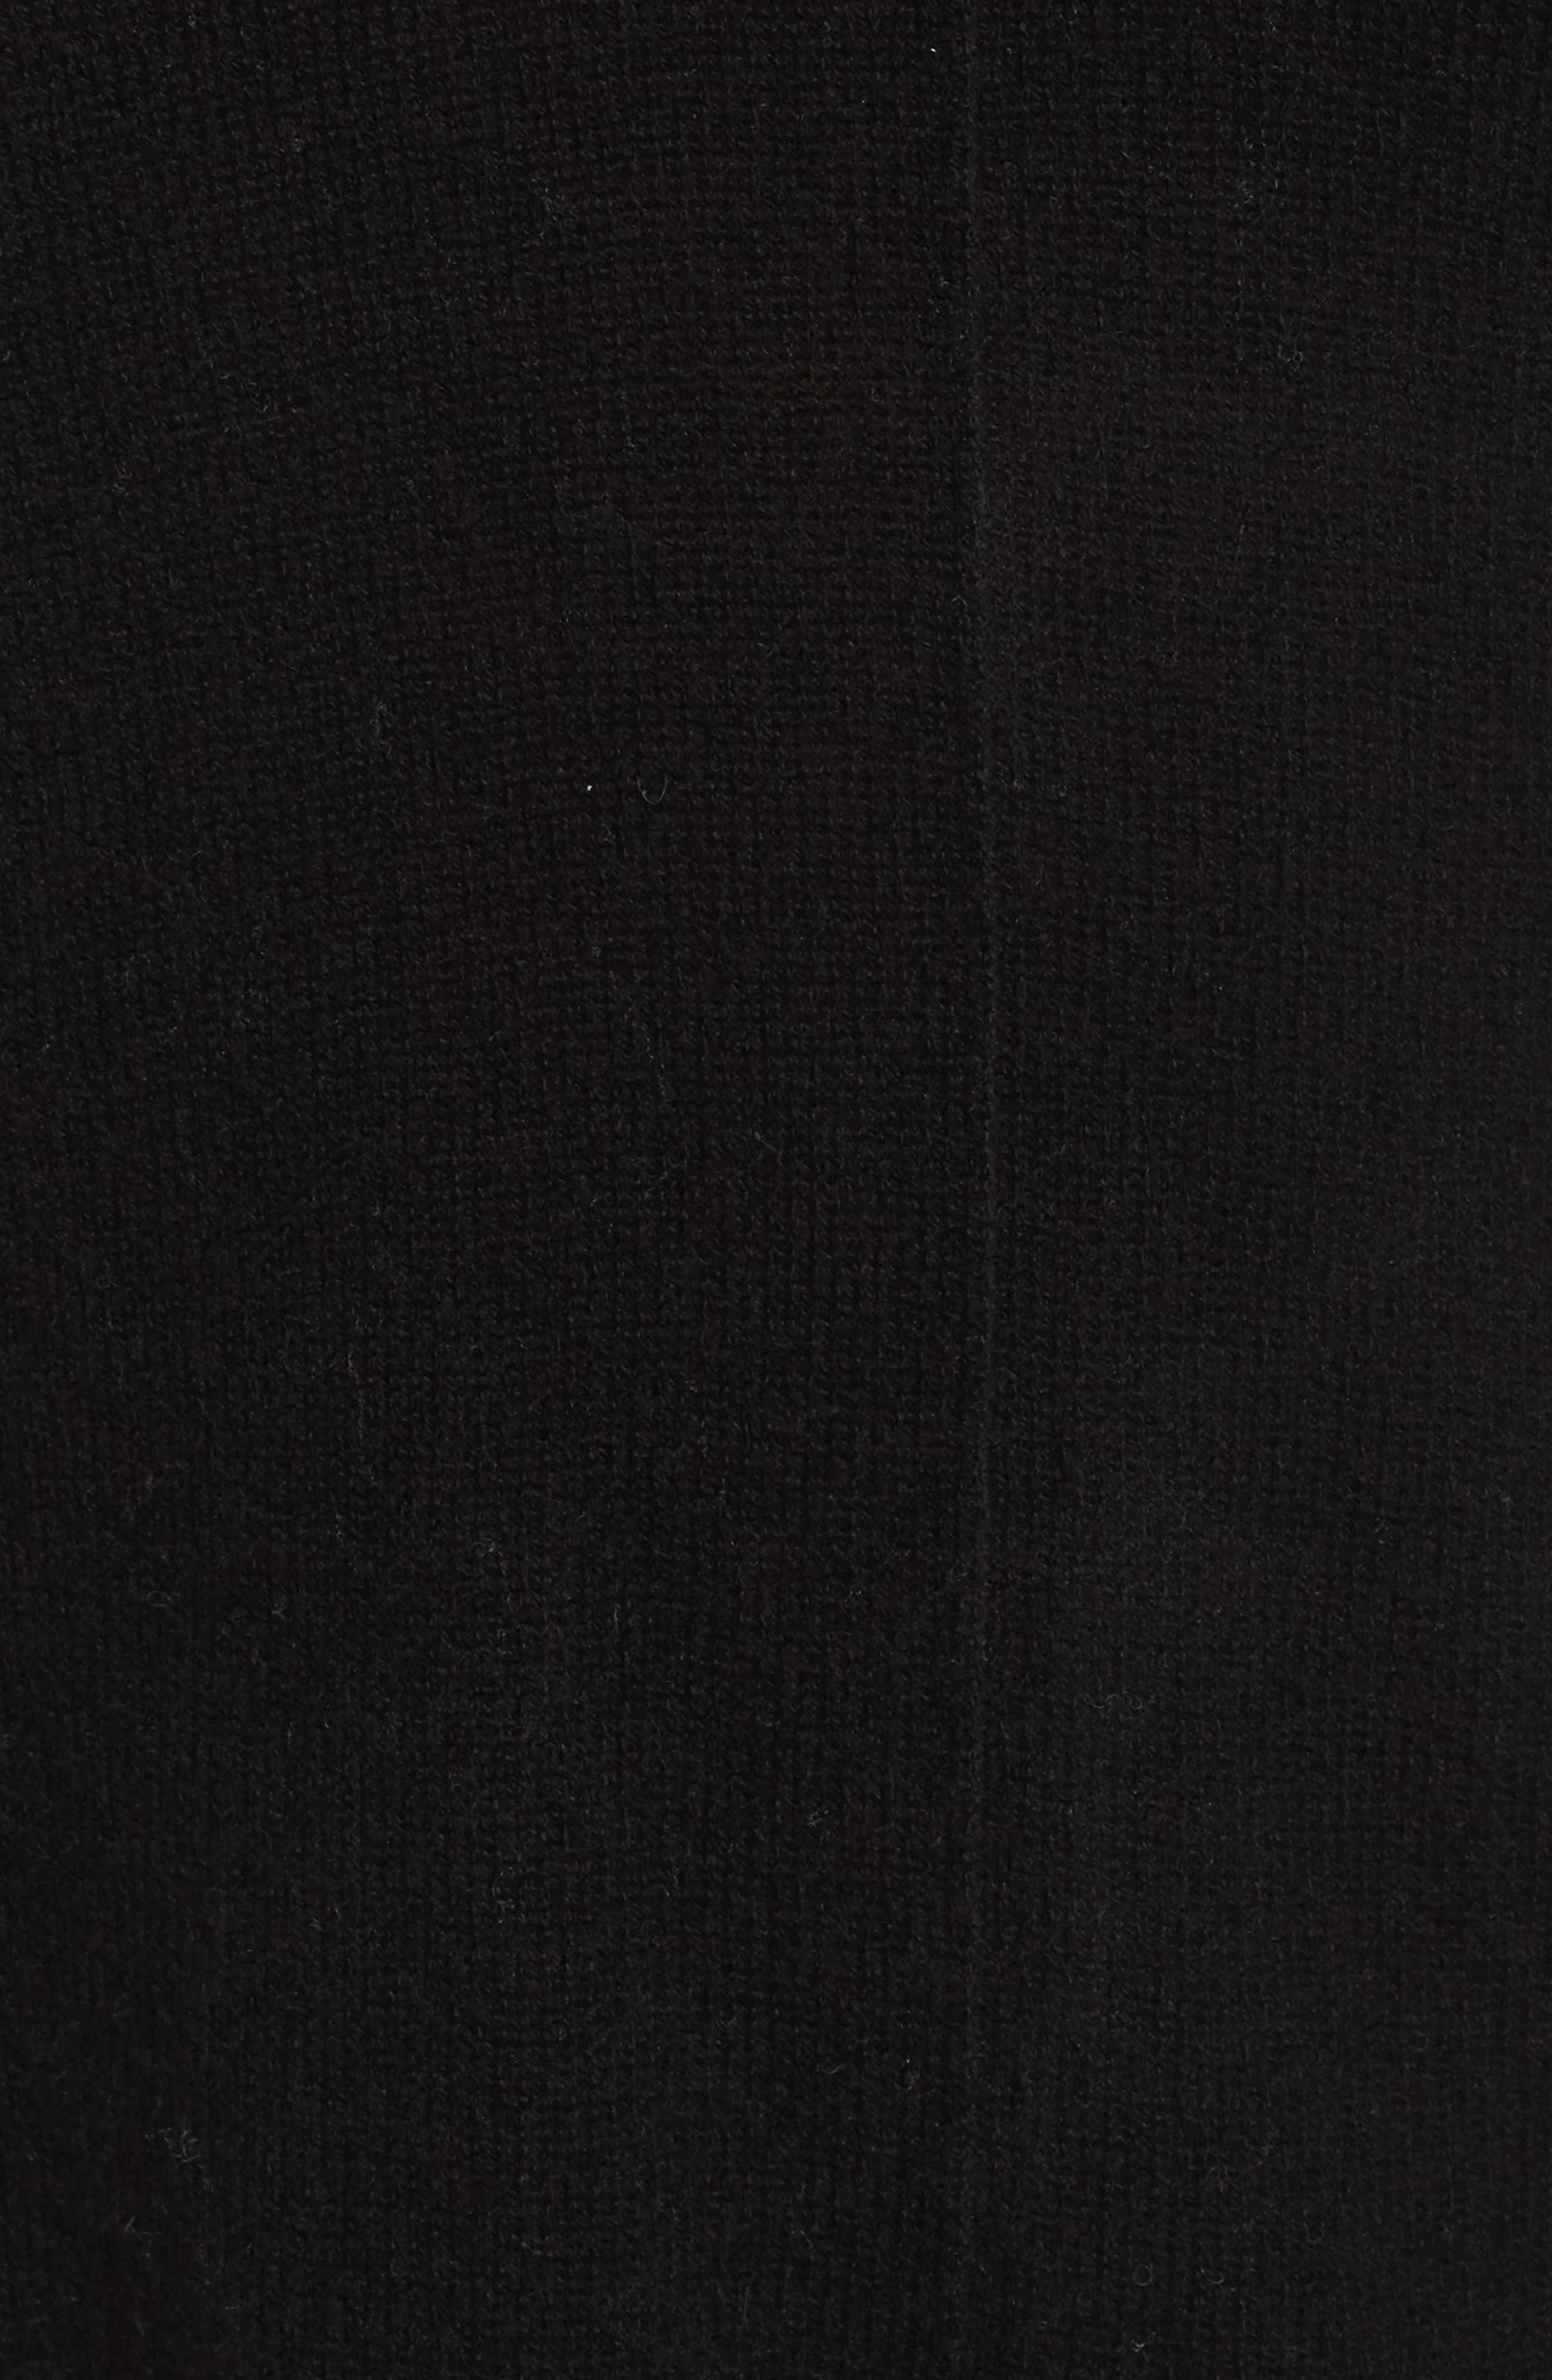 Easy V-Neck Wool & Cashmere Pullover,                             Alternate thumbnail 5, color,                             001